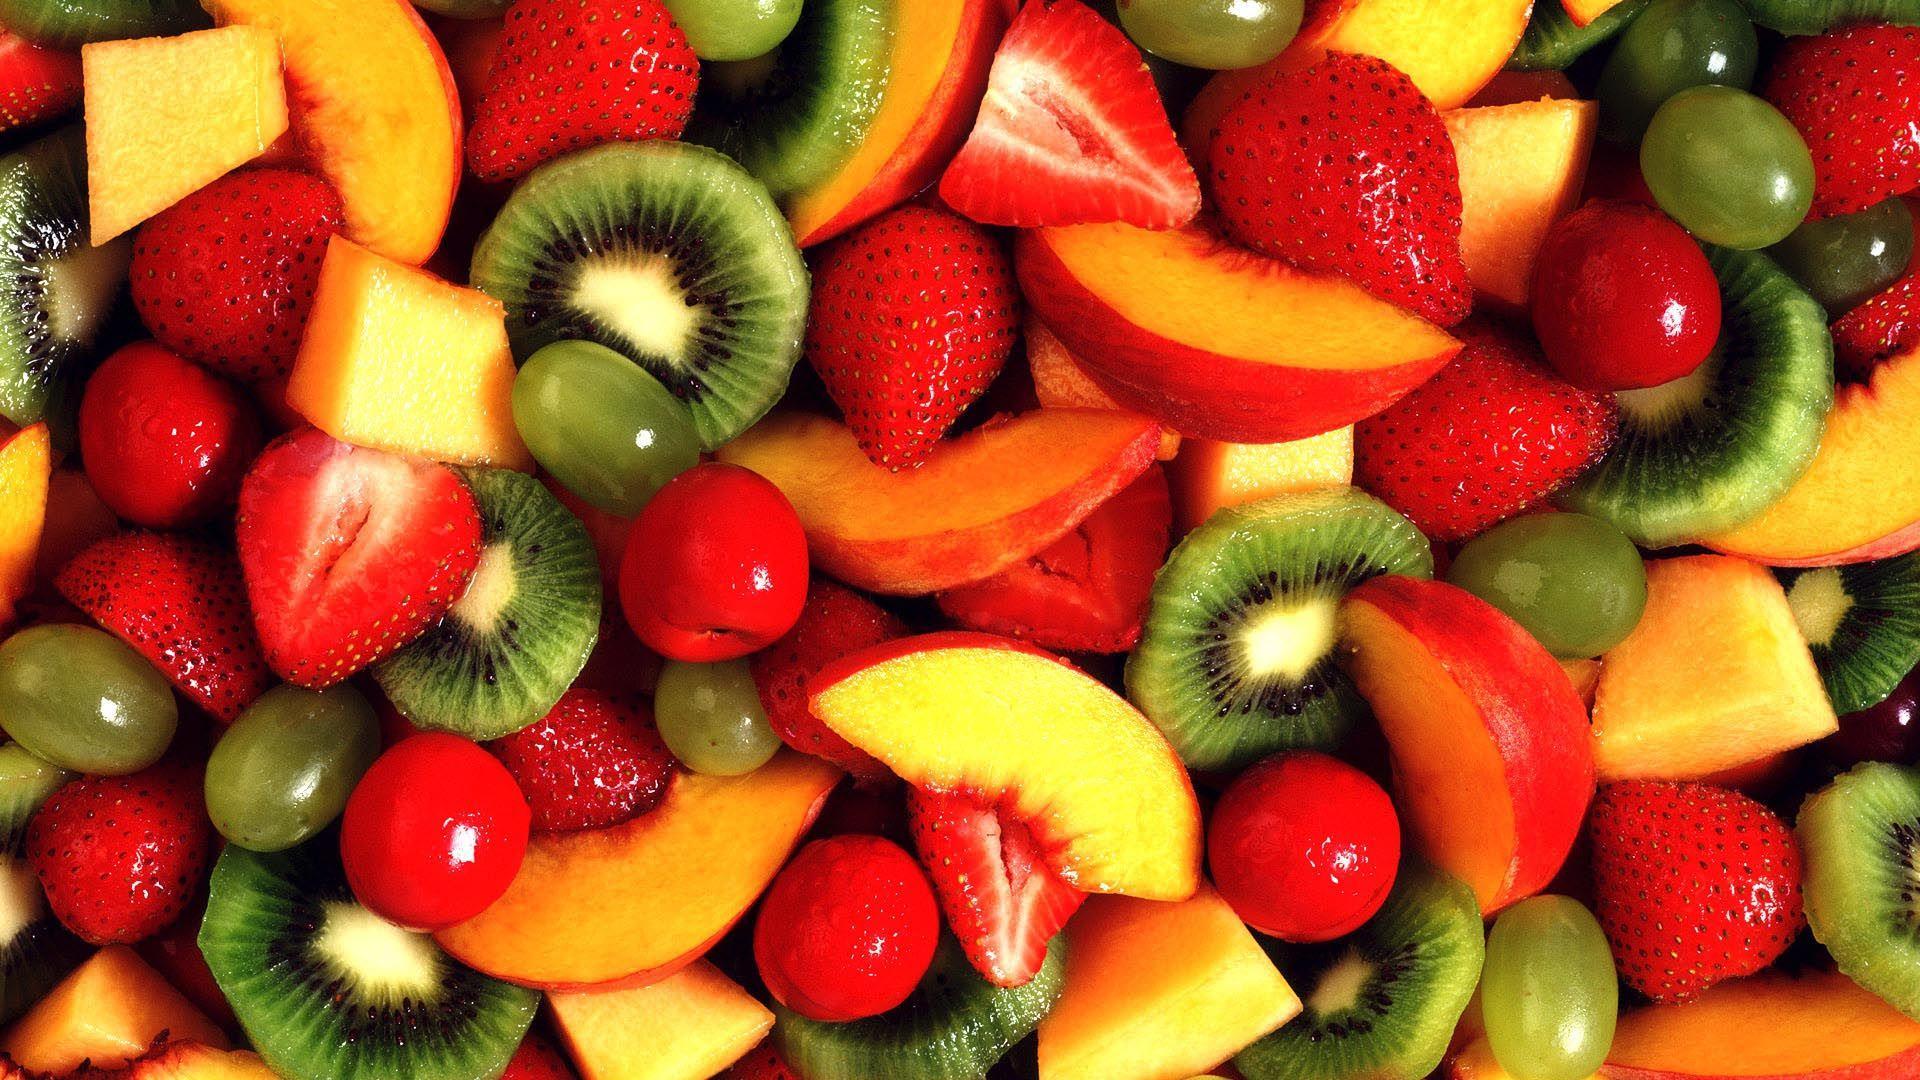 Tumblr Food Desktop Wallpapers Top Free Tumblr Food